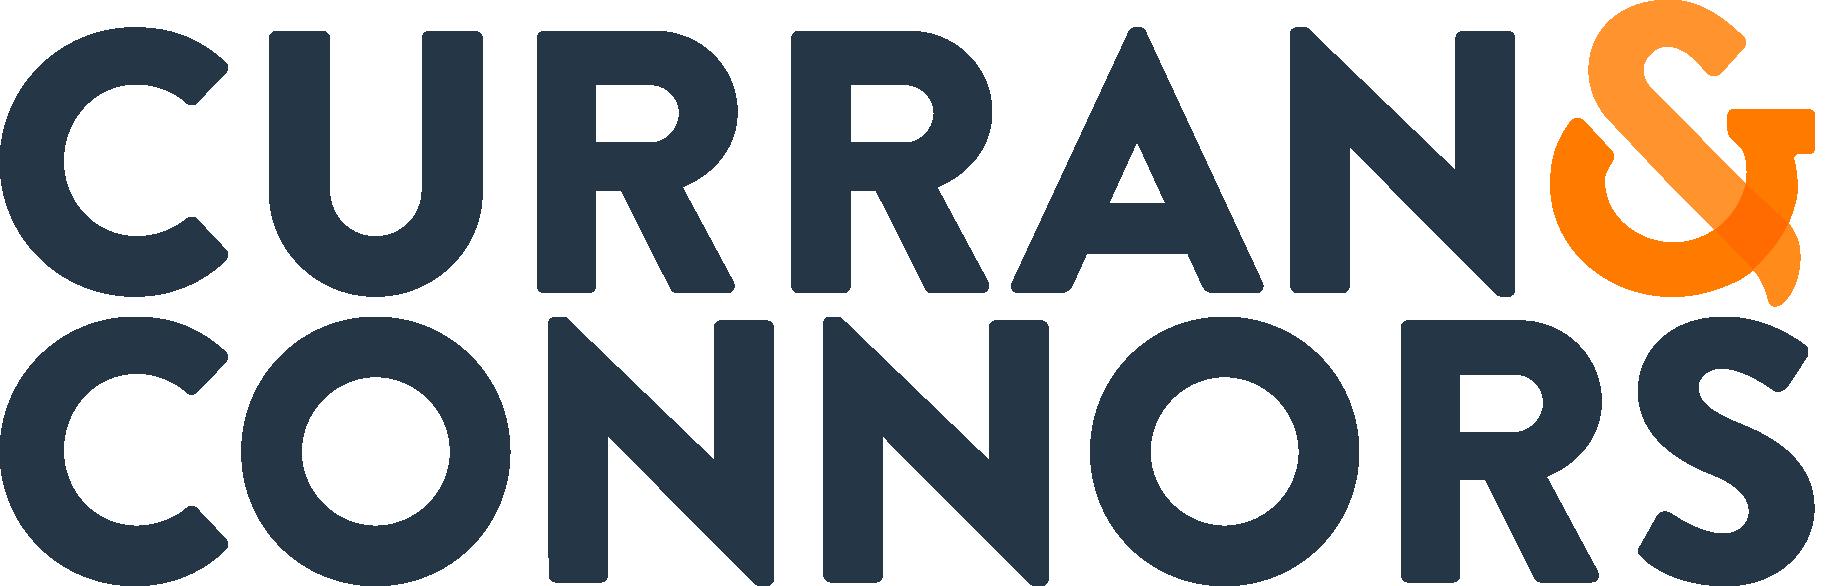 curran-connors Logo